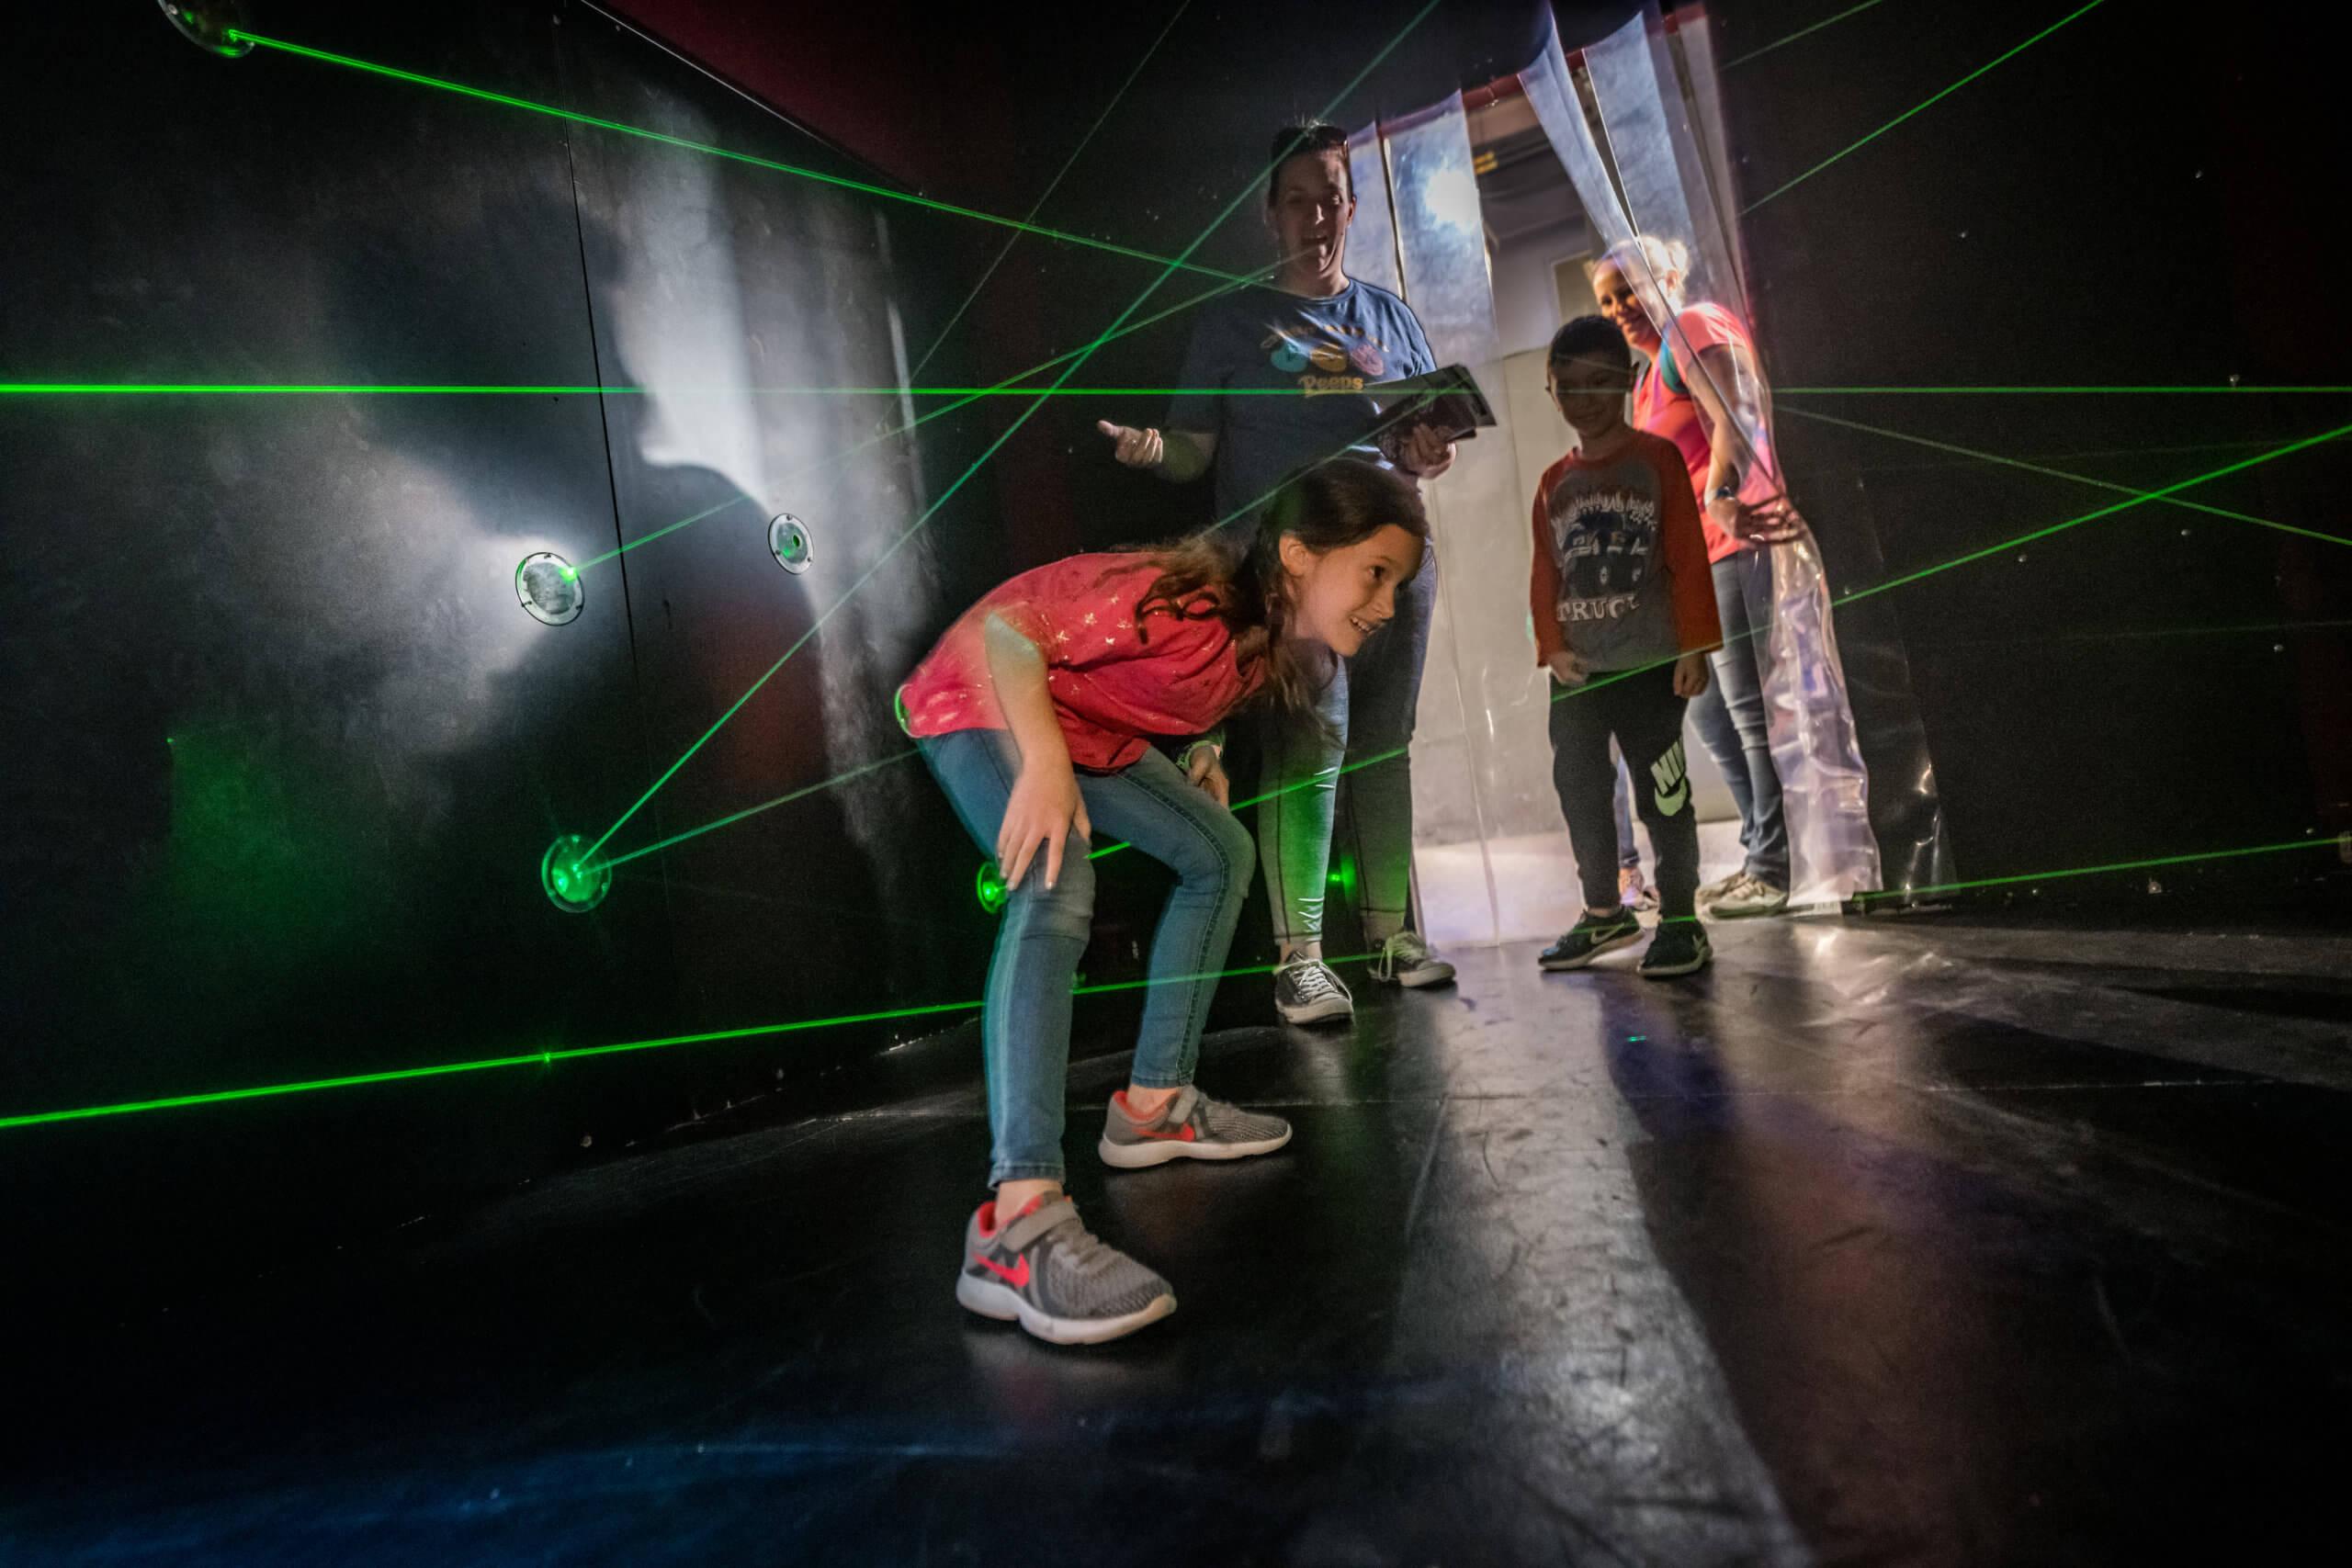 guests navigating a laser light maze